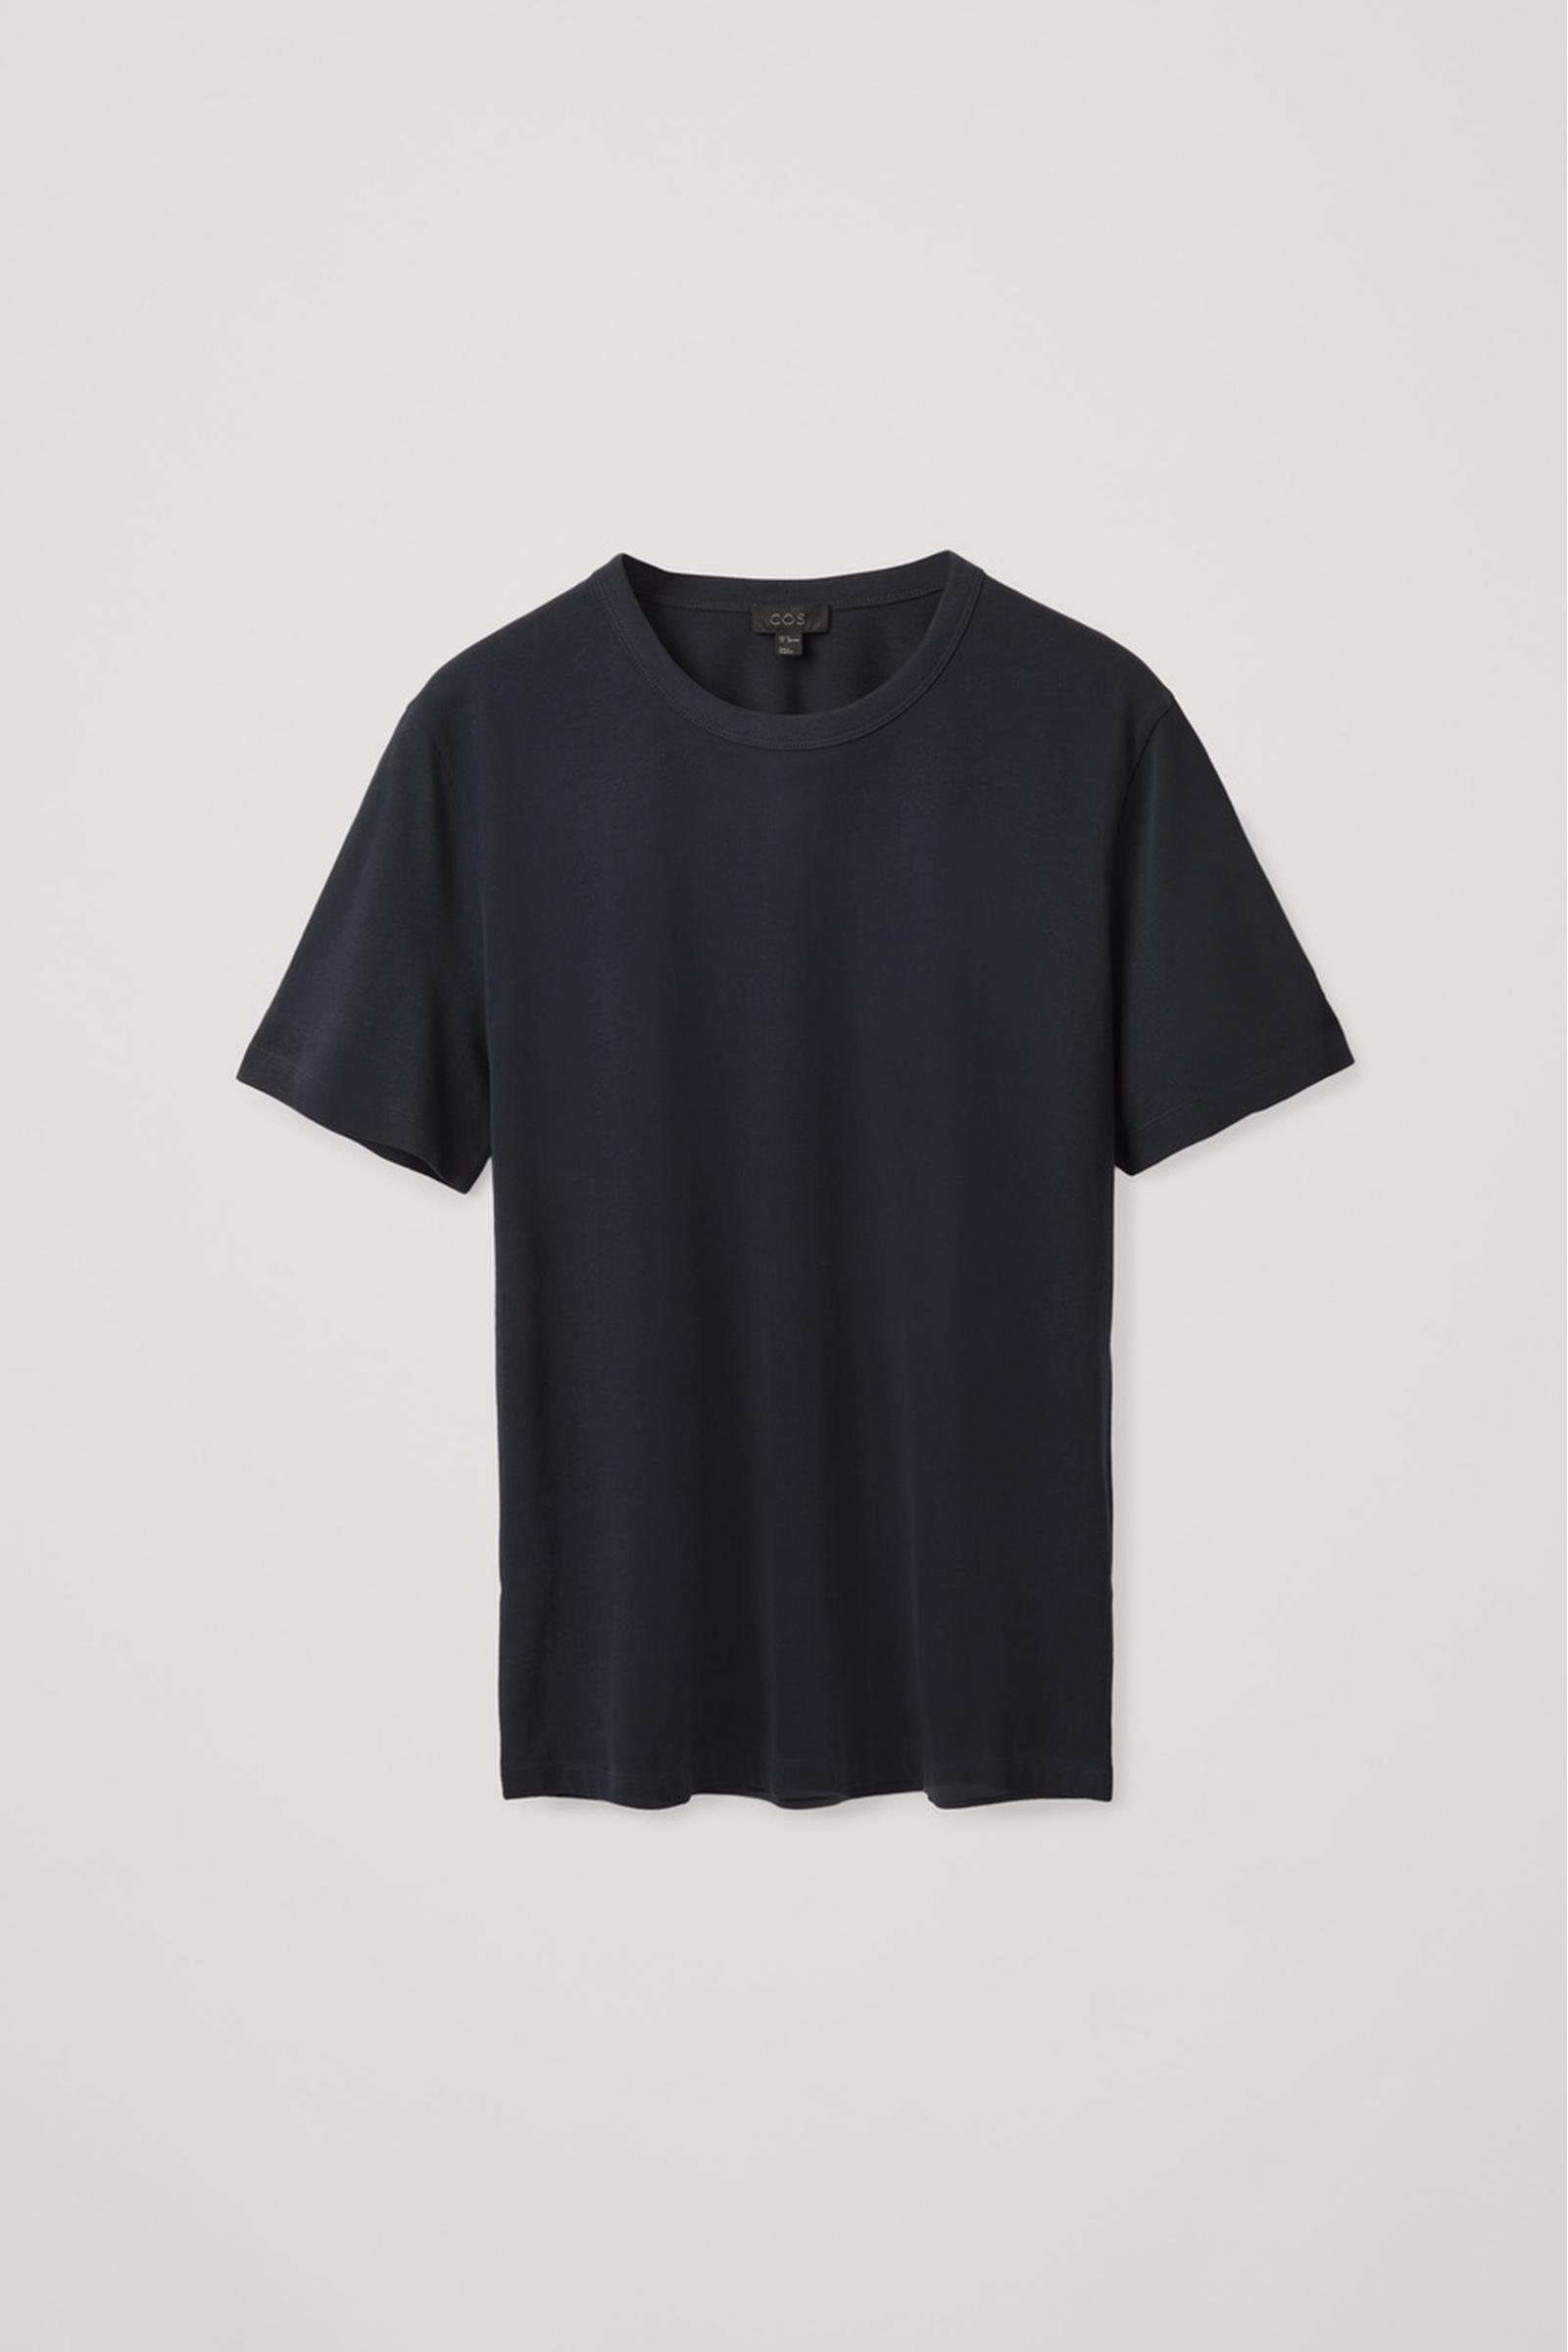 COS 레귤러 핏 브러쉬드 코튼 티셔츠의 블루컬러 Product입니다.